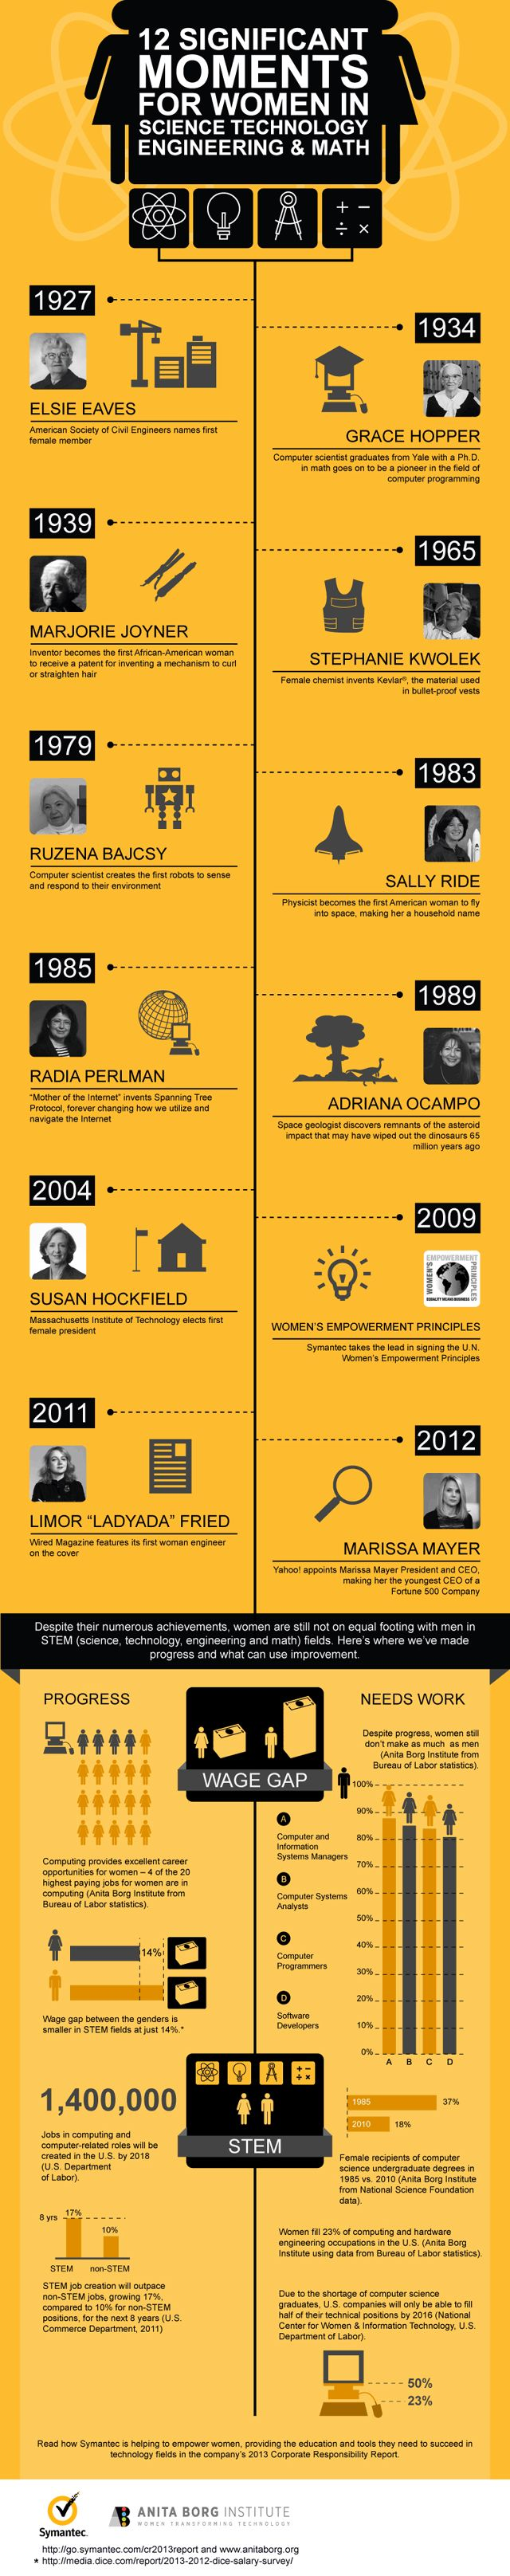 Ada Lovelace Day: Women Tech Accomplishments [Infographic] By Hubert Nguyen on 1…